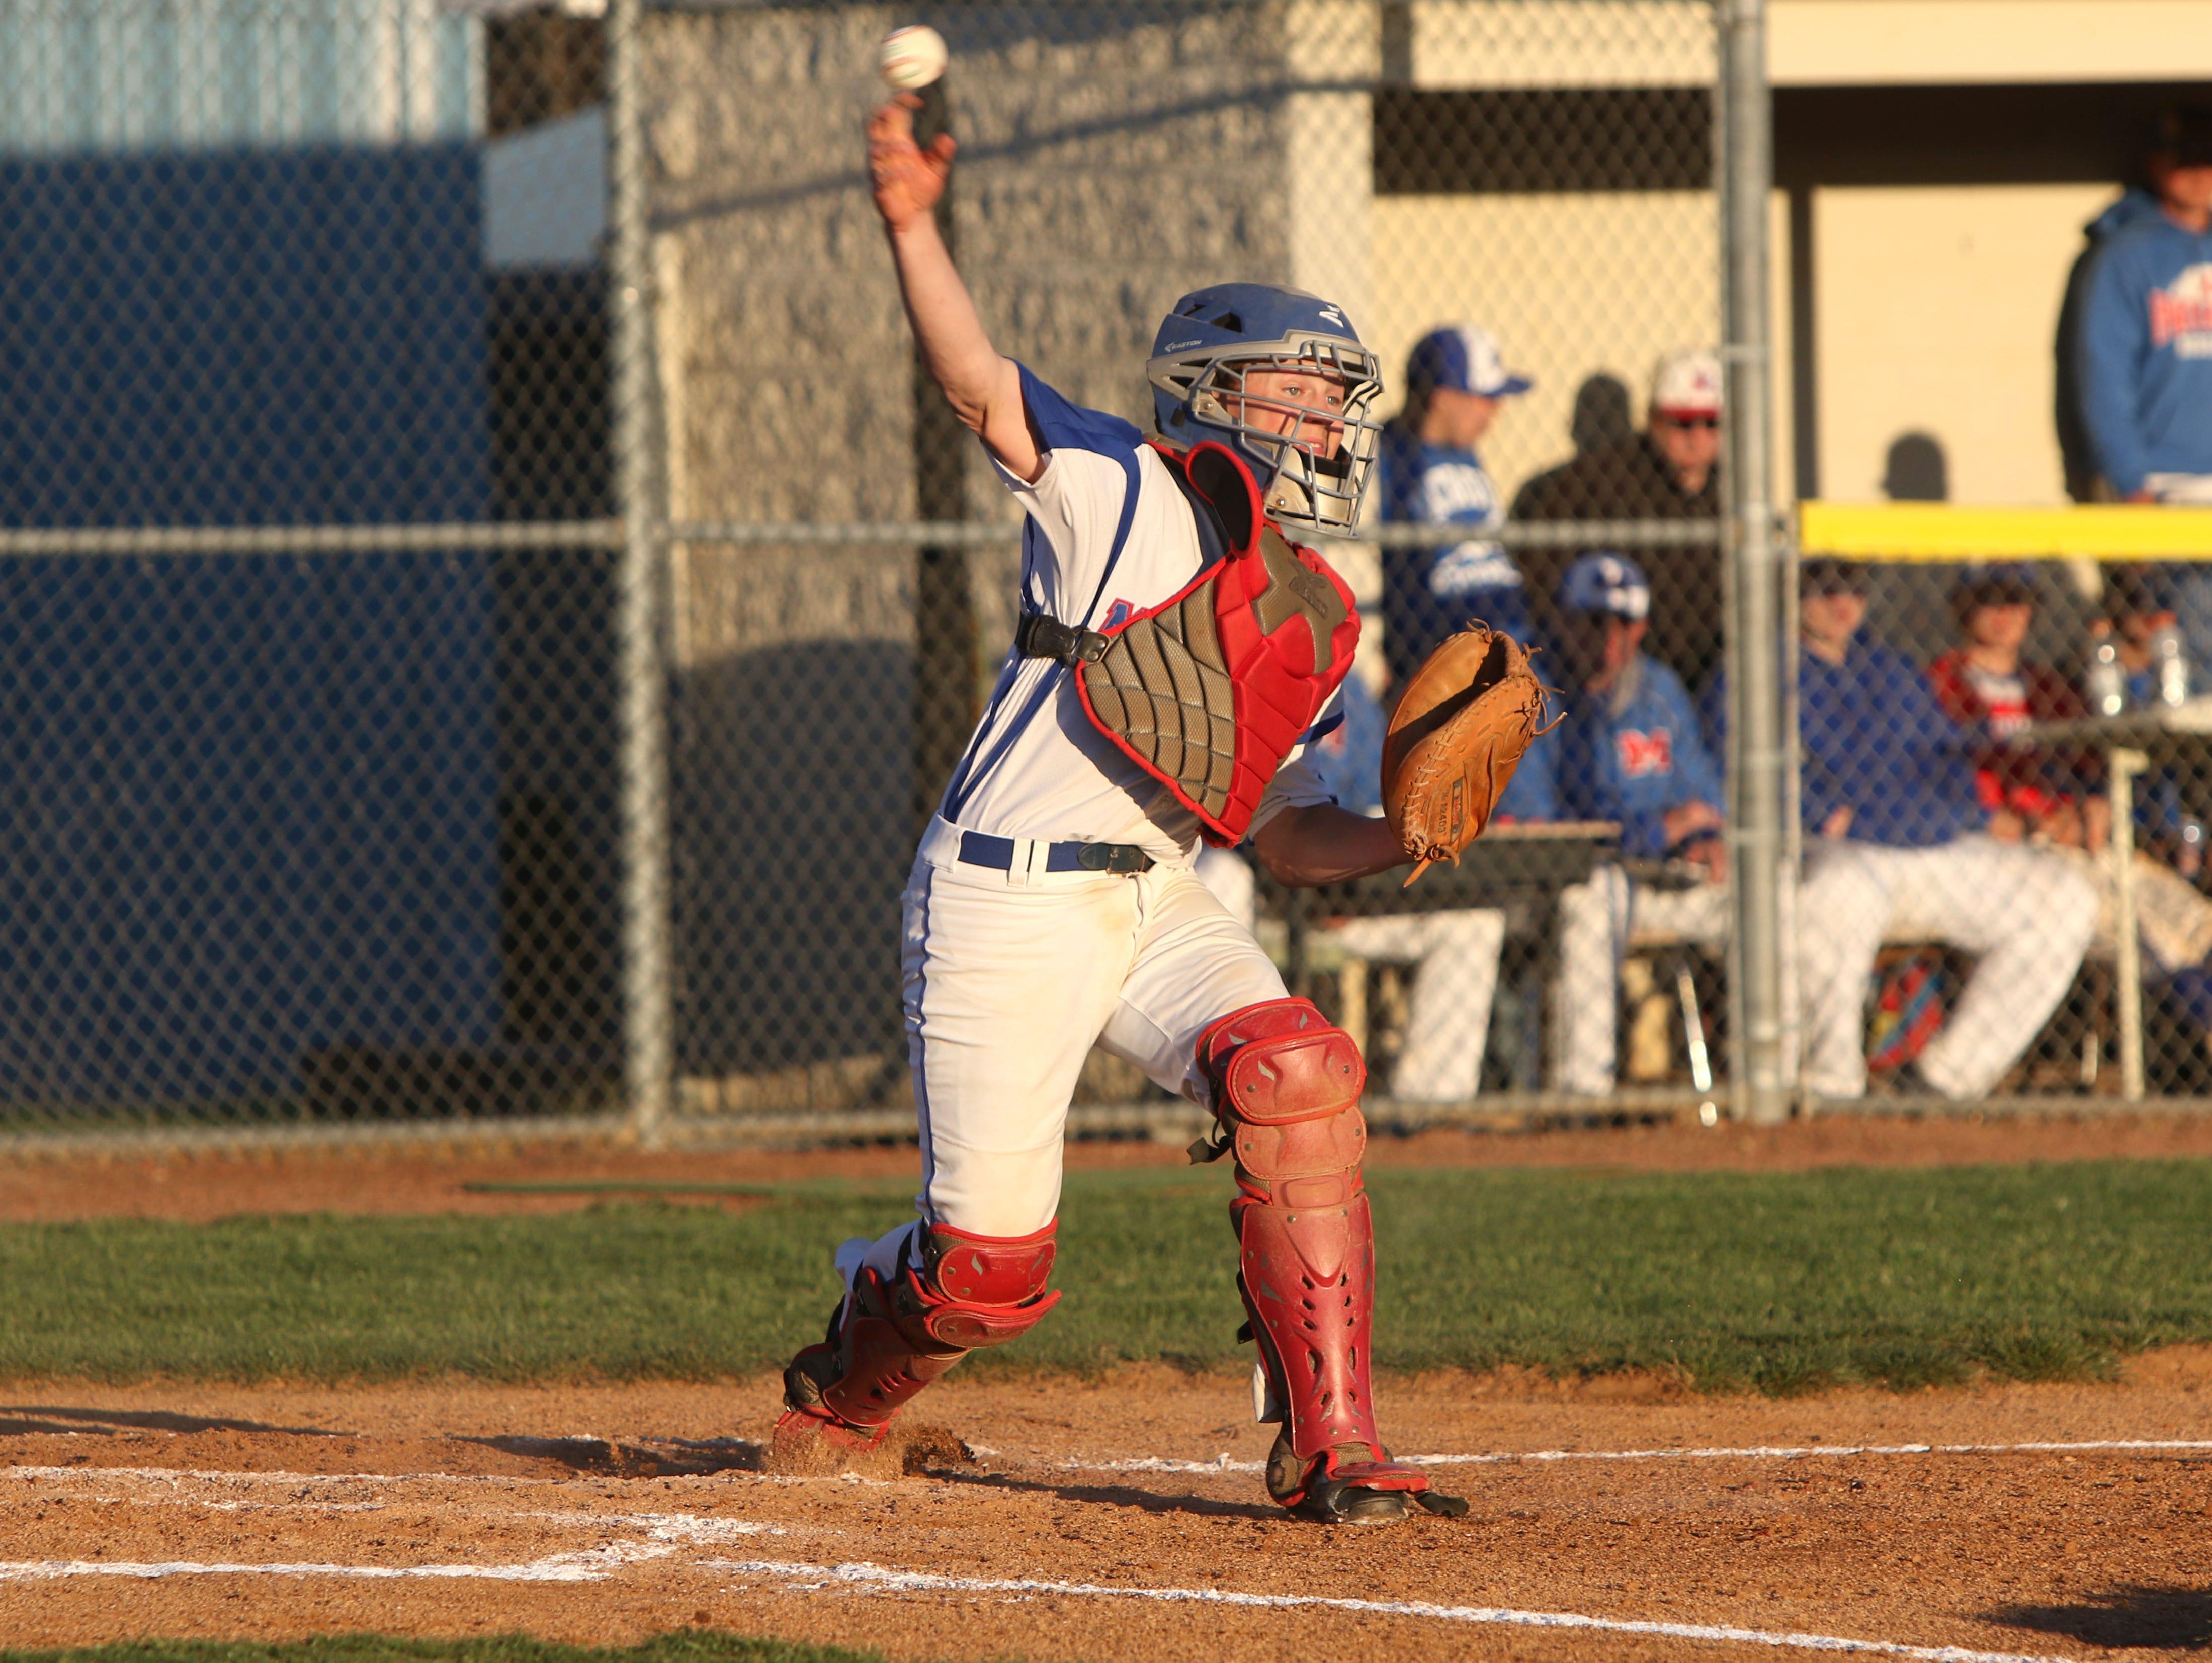 Madison catcher Jordan Baker makes a throw Monday night in Marshall.